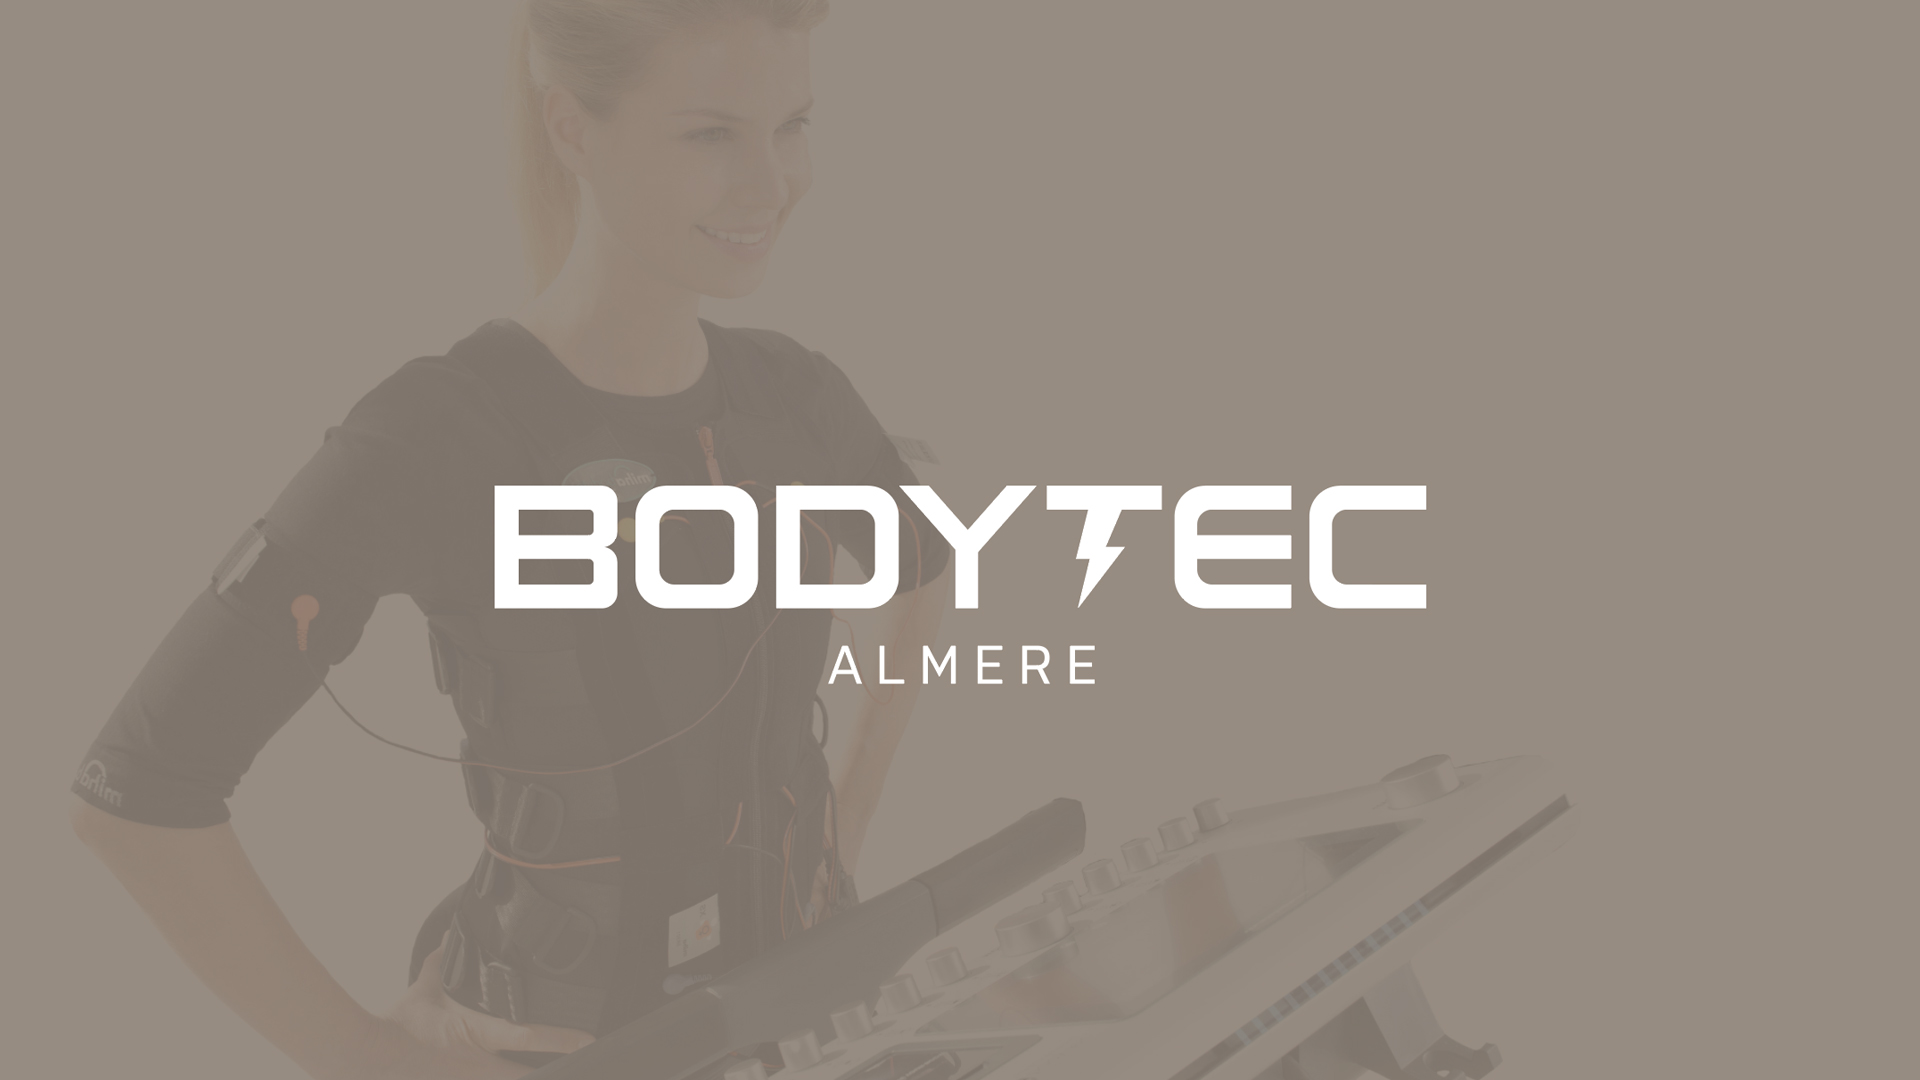 Bodytec Almere foto 1